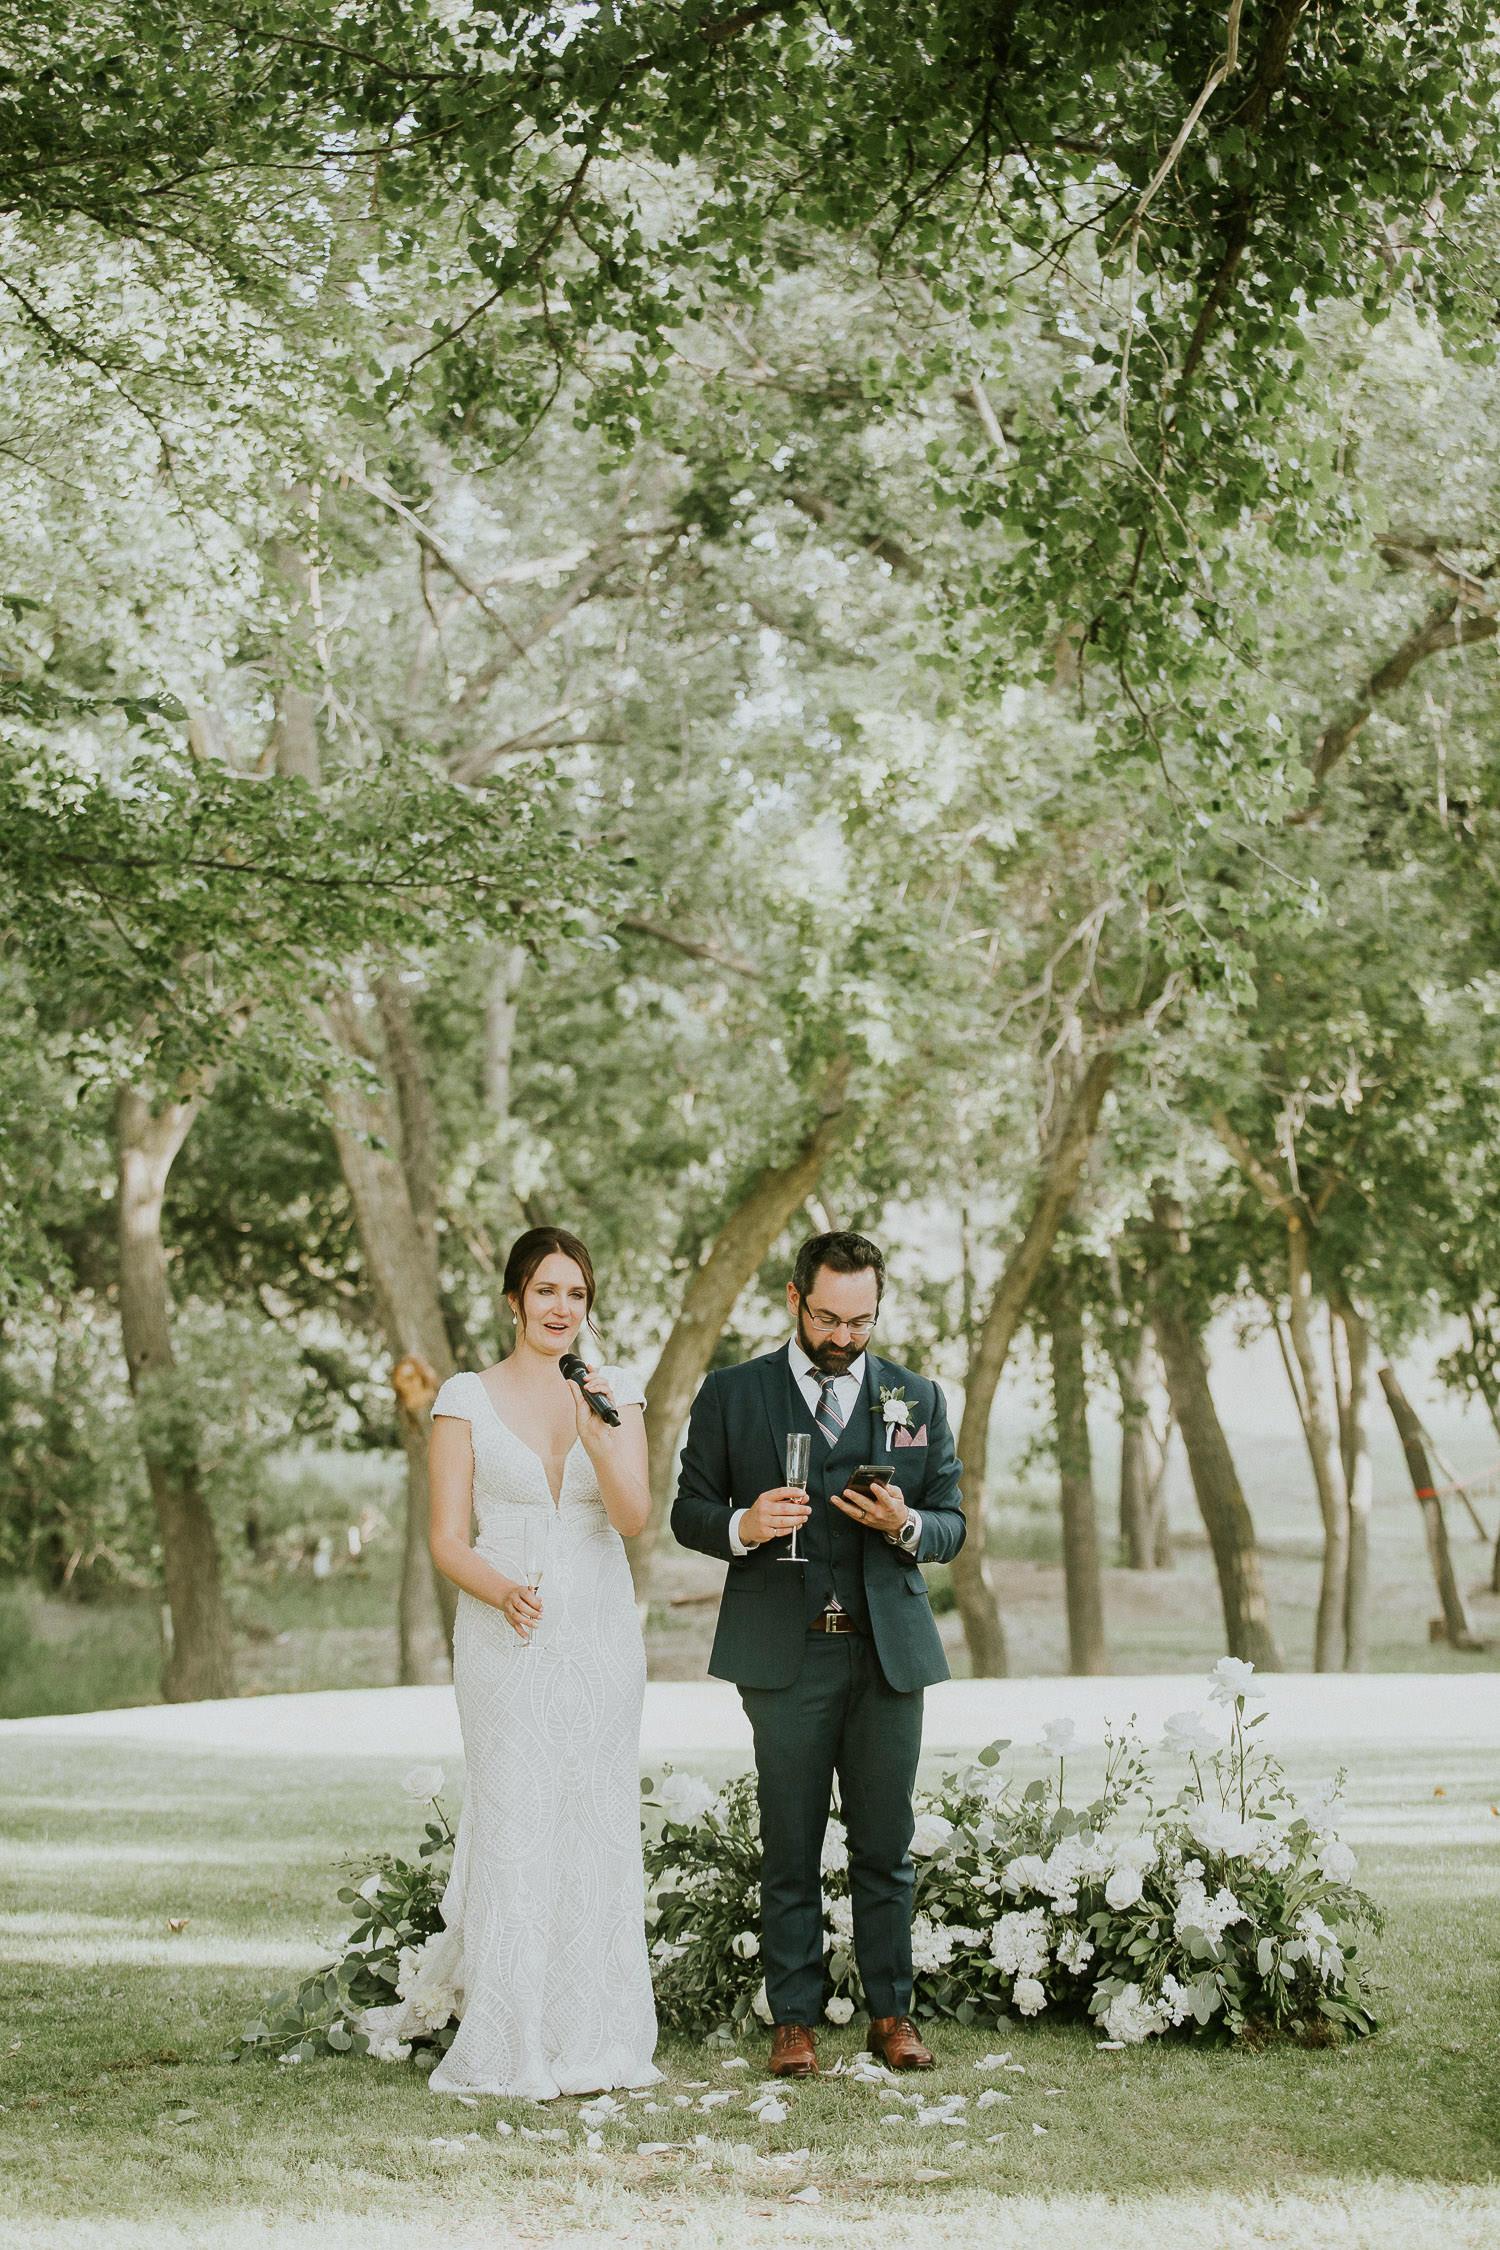 summer-backyard-wedding-in-alberta-sarah-pukin-0170